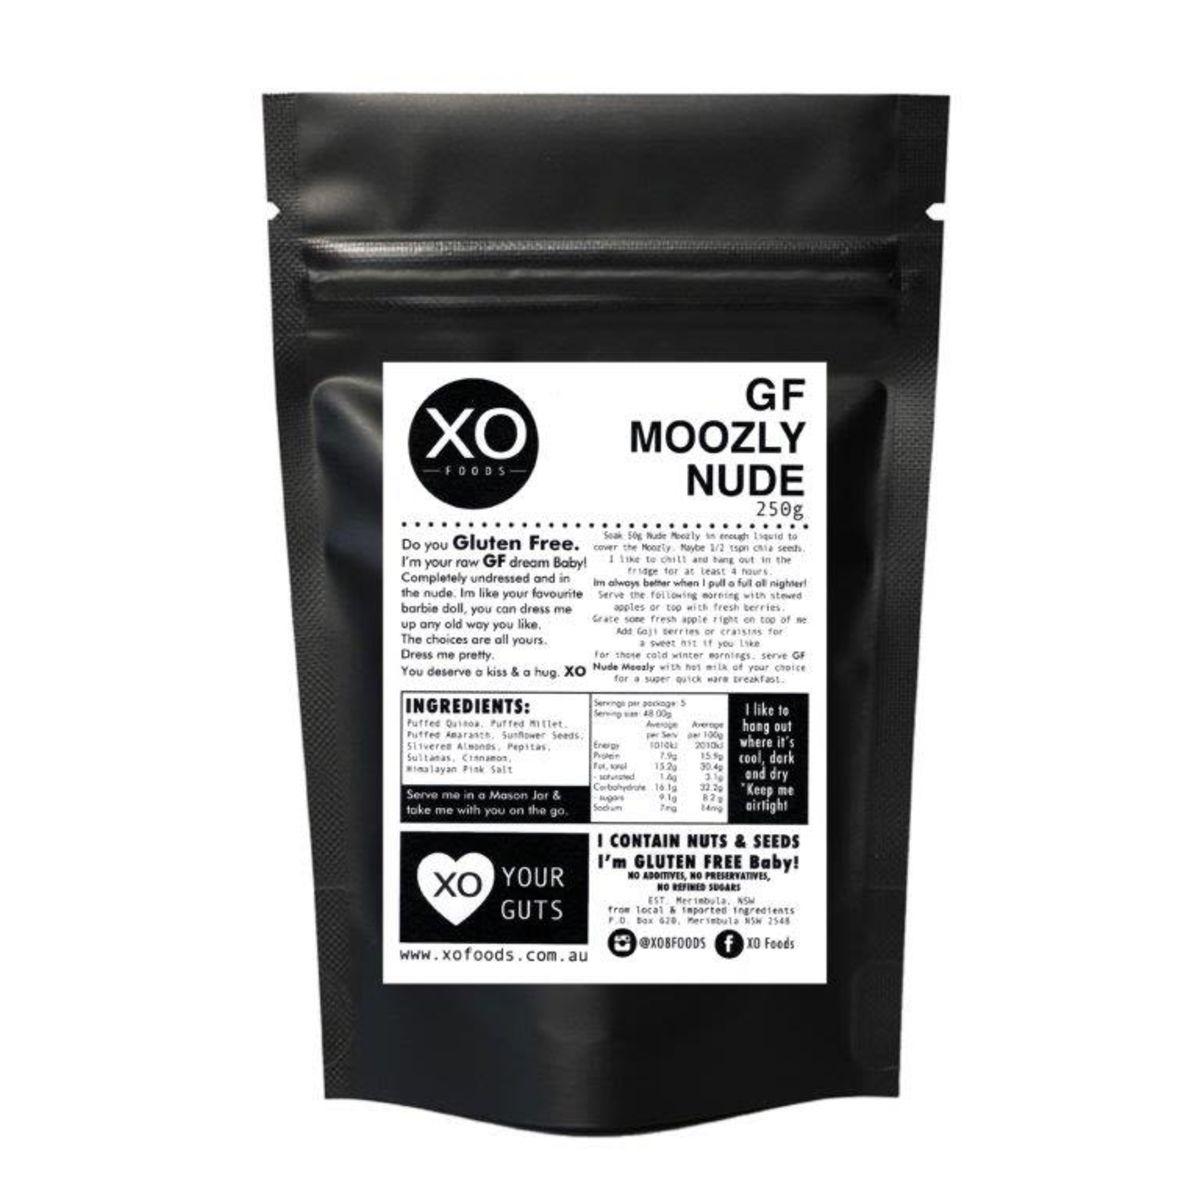 XO Foods - Gluten Free Nude Moozly